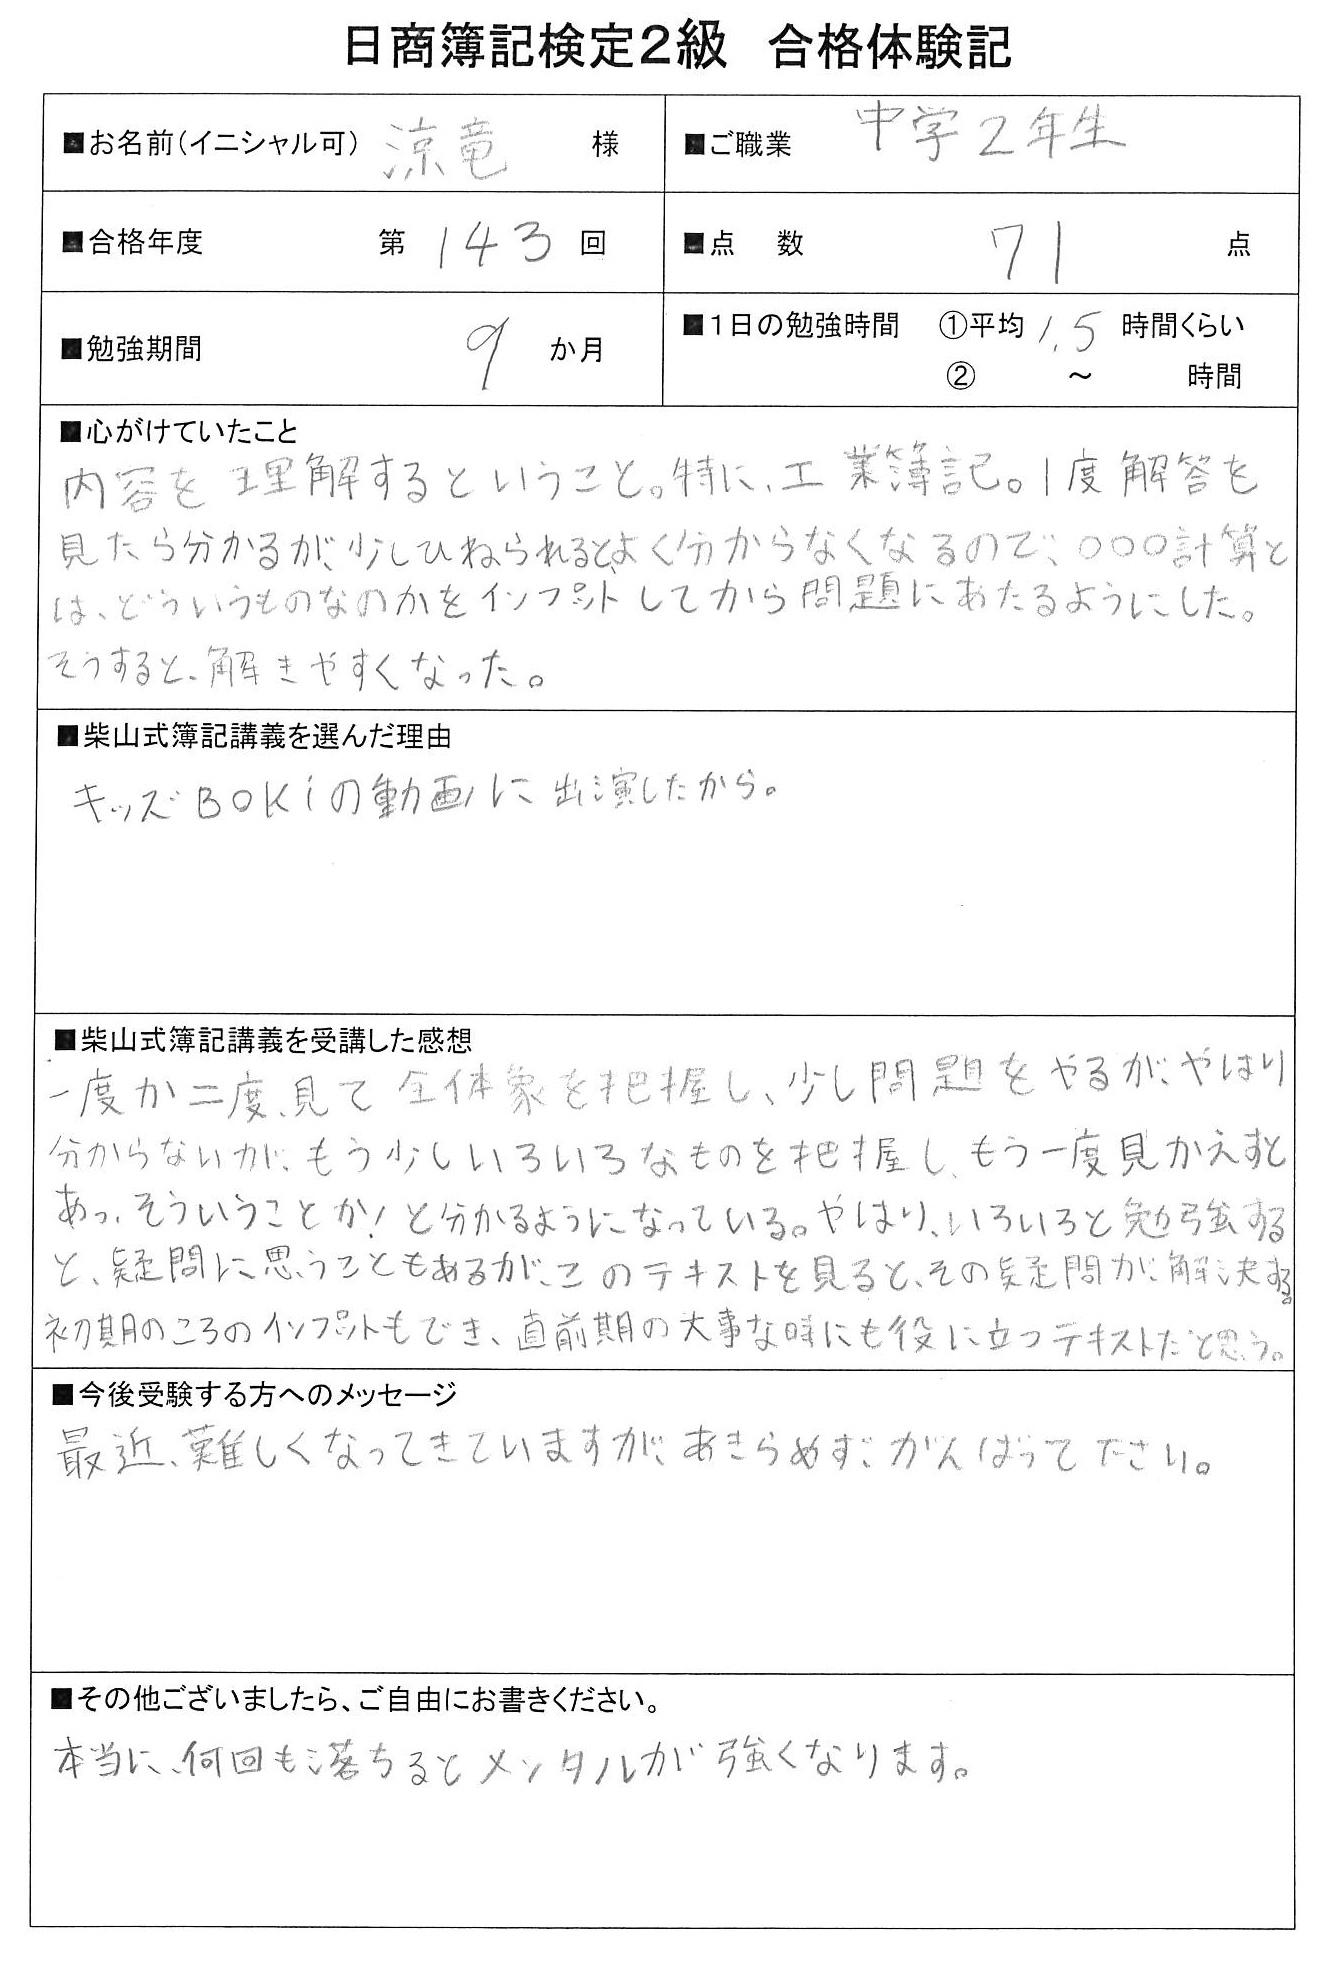 goukaku-143-1